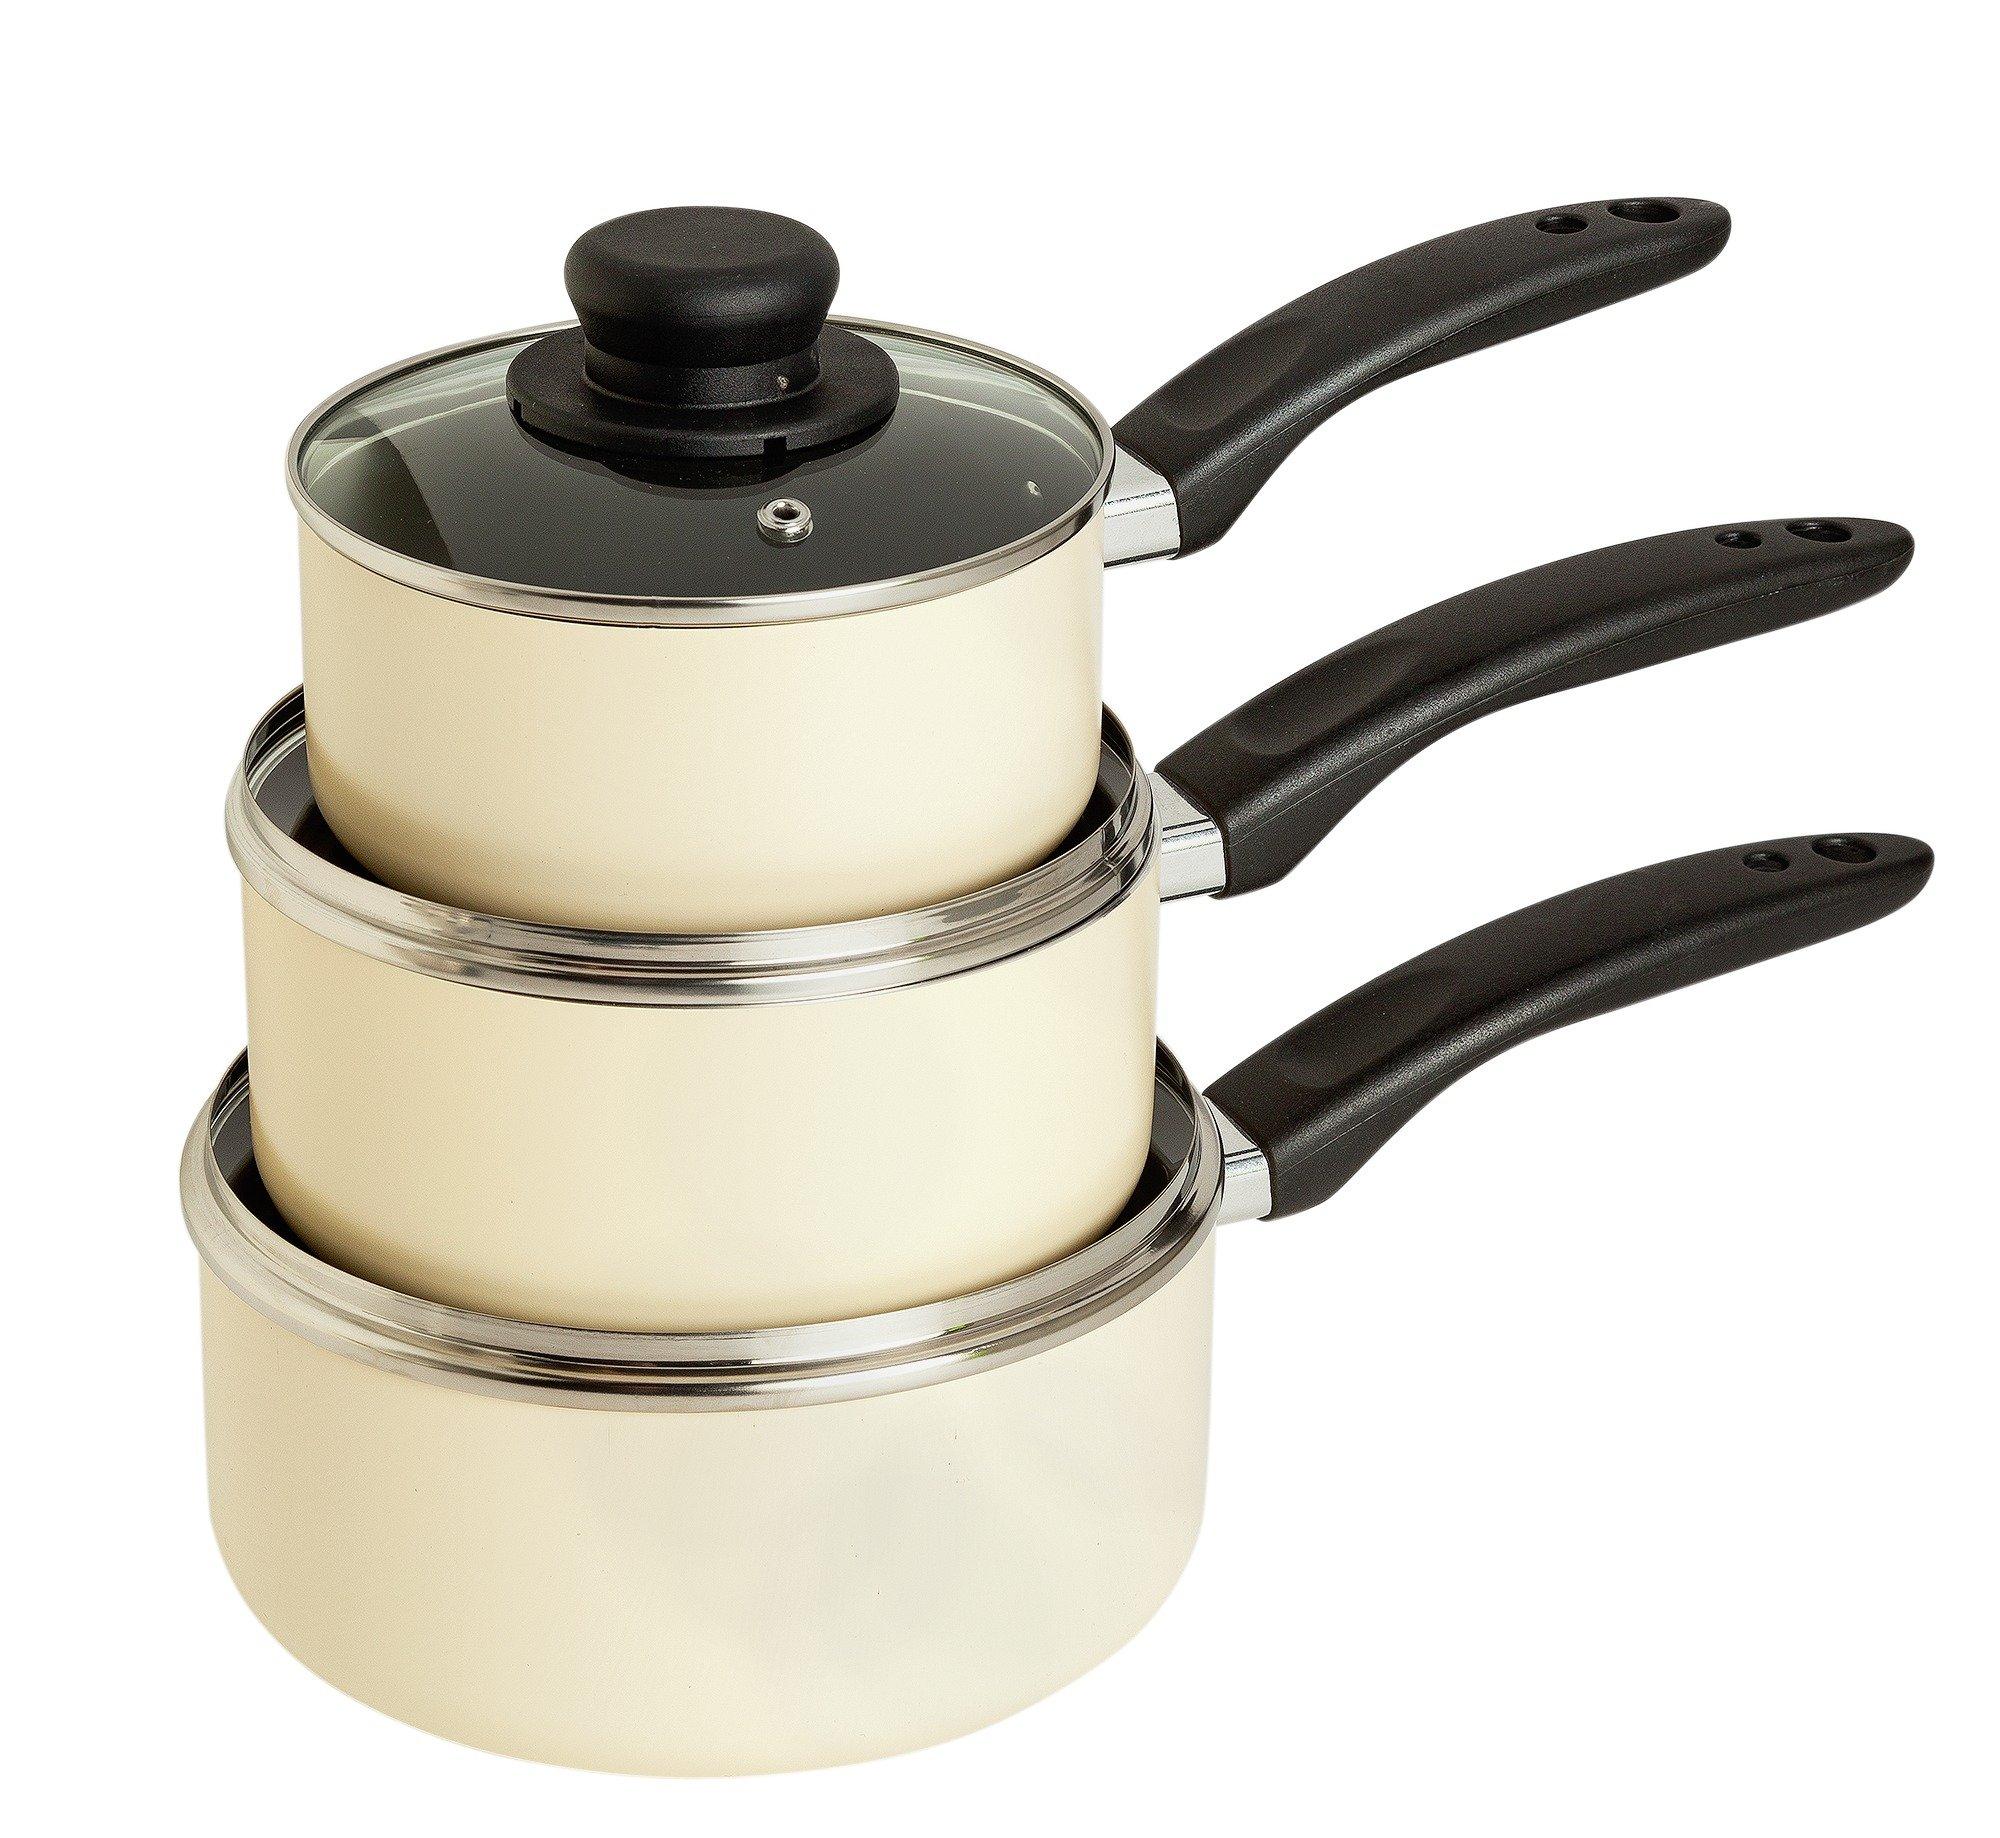 Argos Home Aluminium Non-Stick 3 Piece Pan Set - Cream